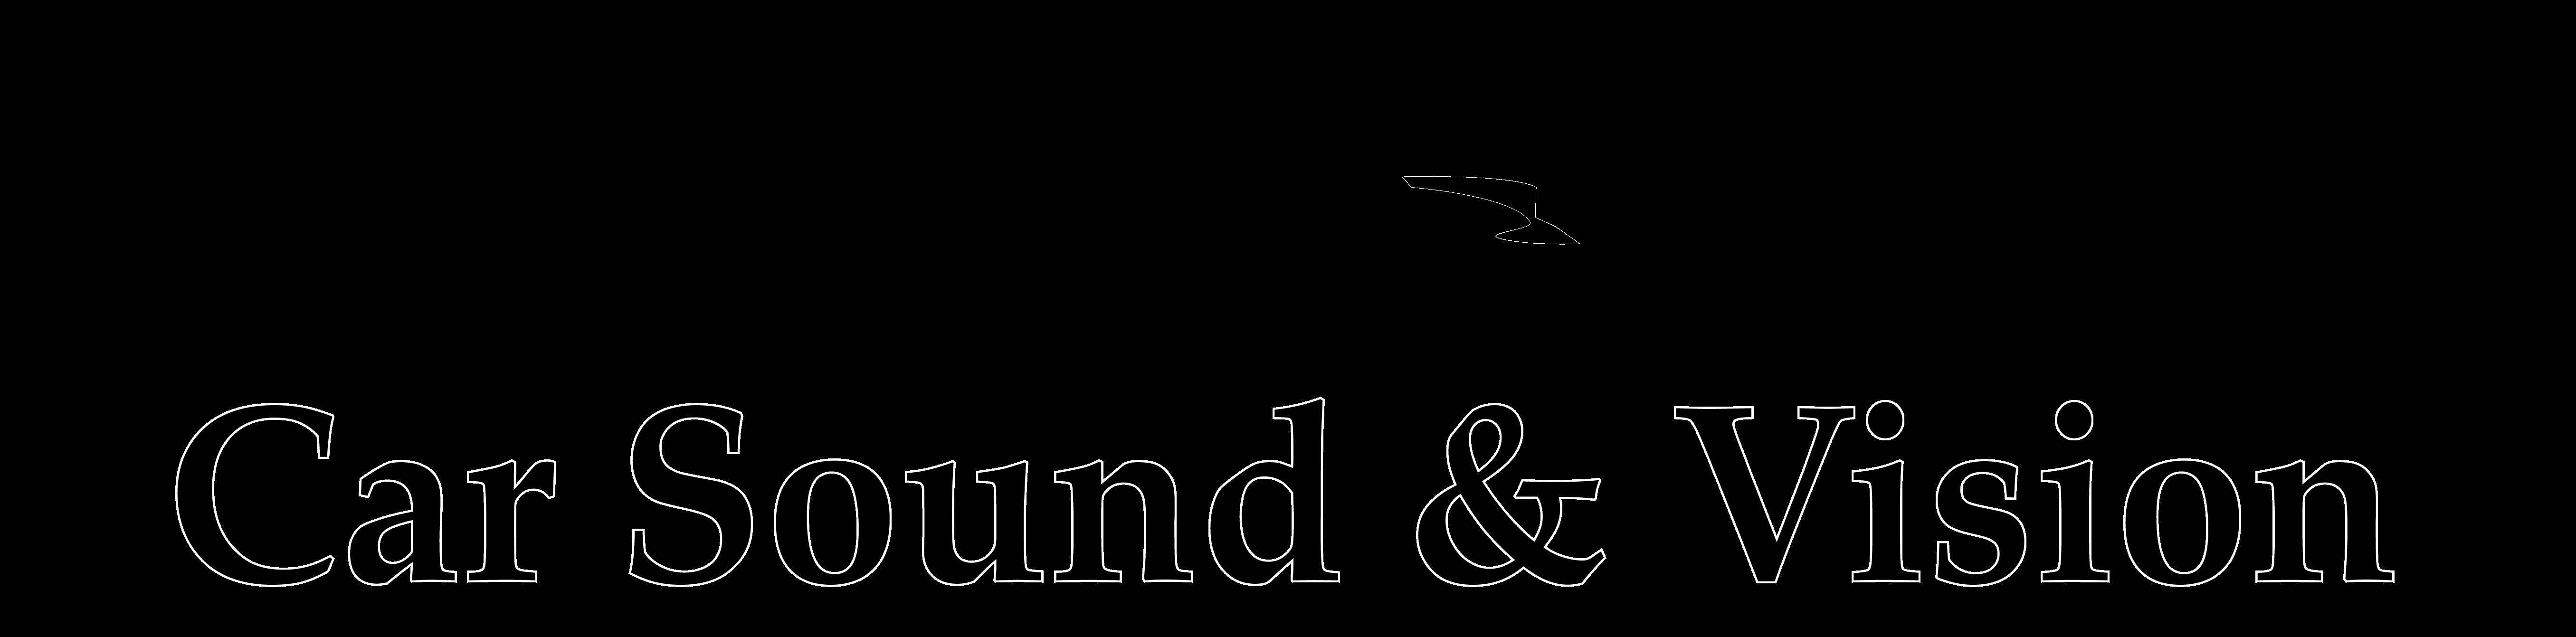 Audiopipe Logo PNG-PlusPNG.com-5423 - Audiopipe Logo PNG